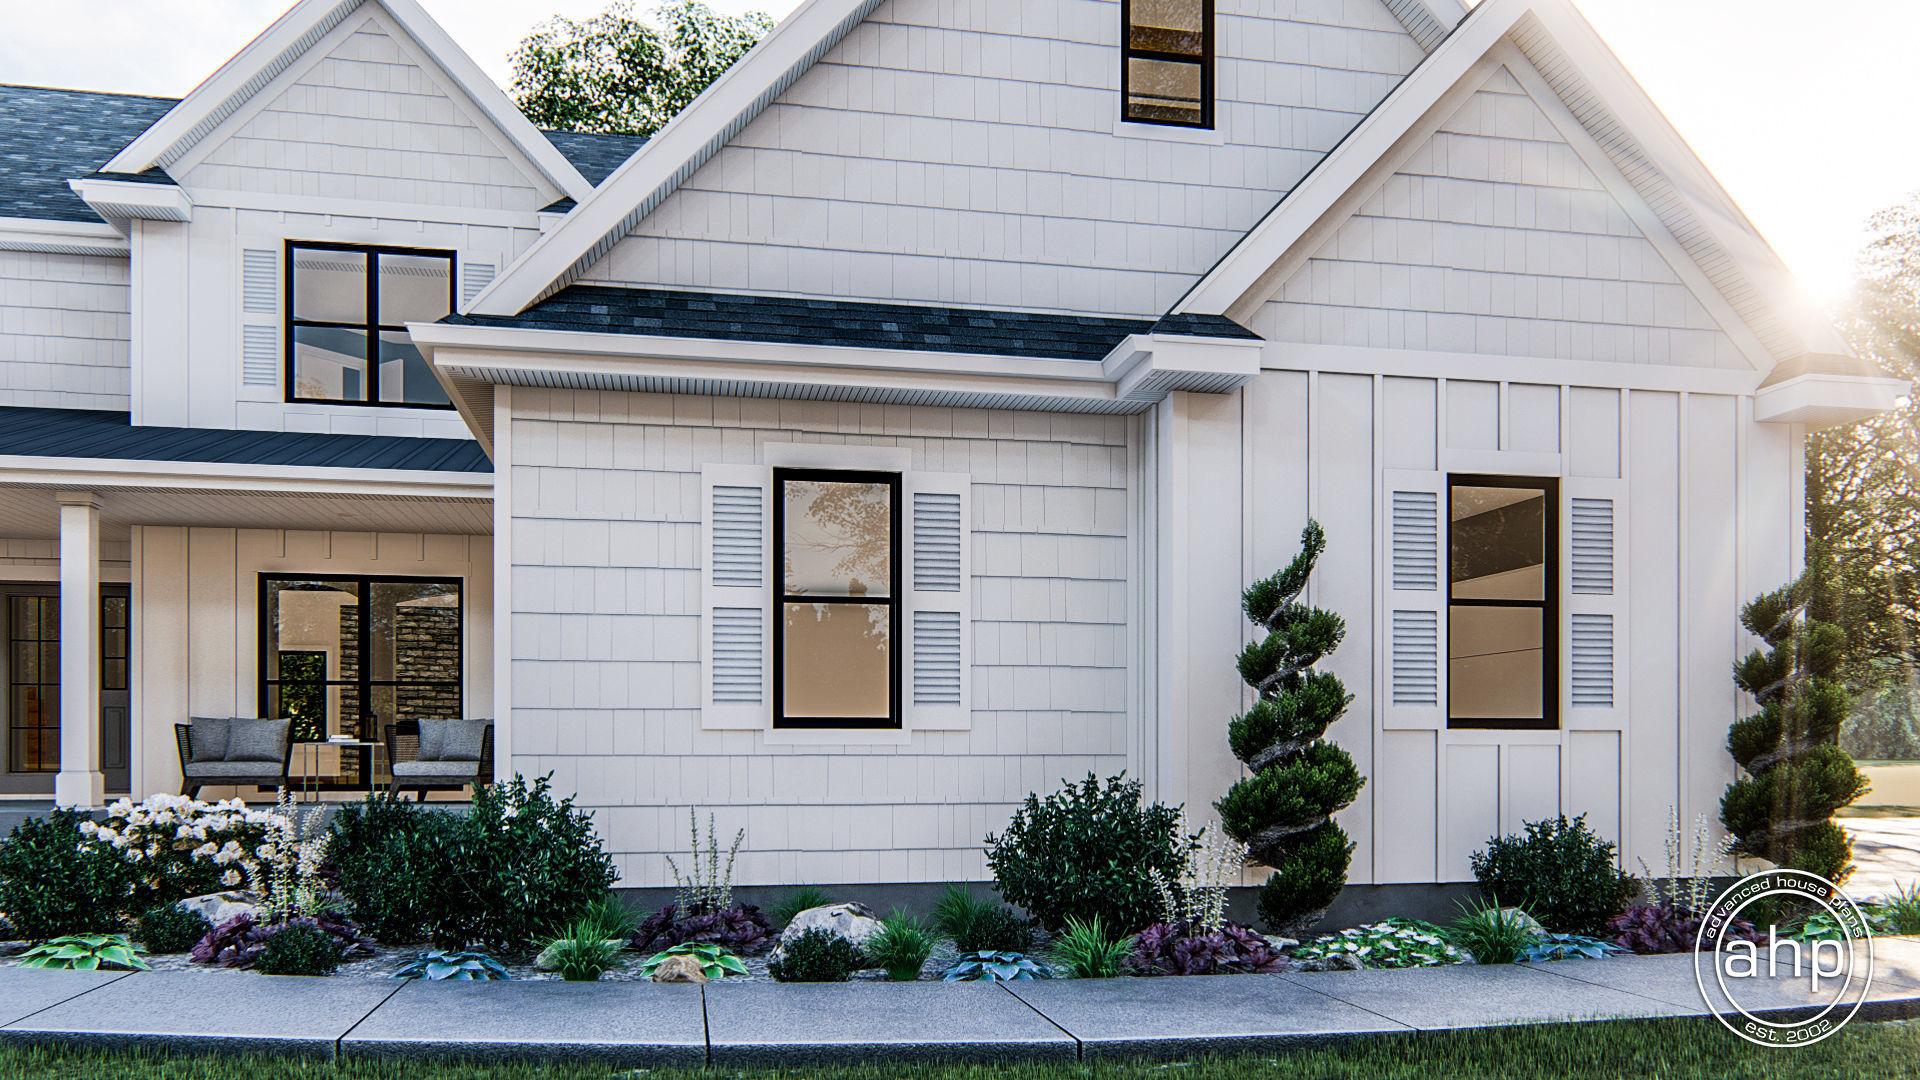 1.5 Story Modern Farmhouse House Plan   Pine Valley